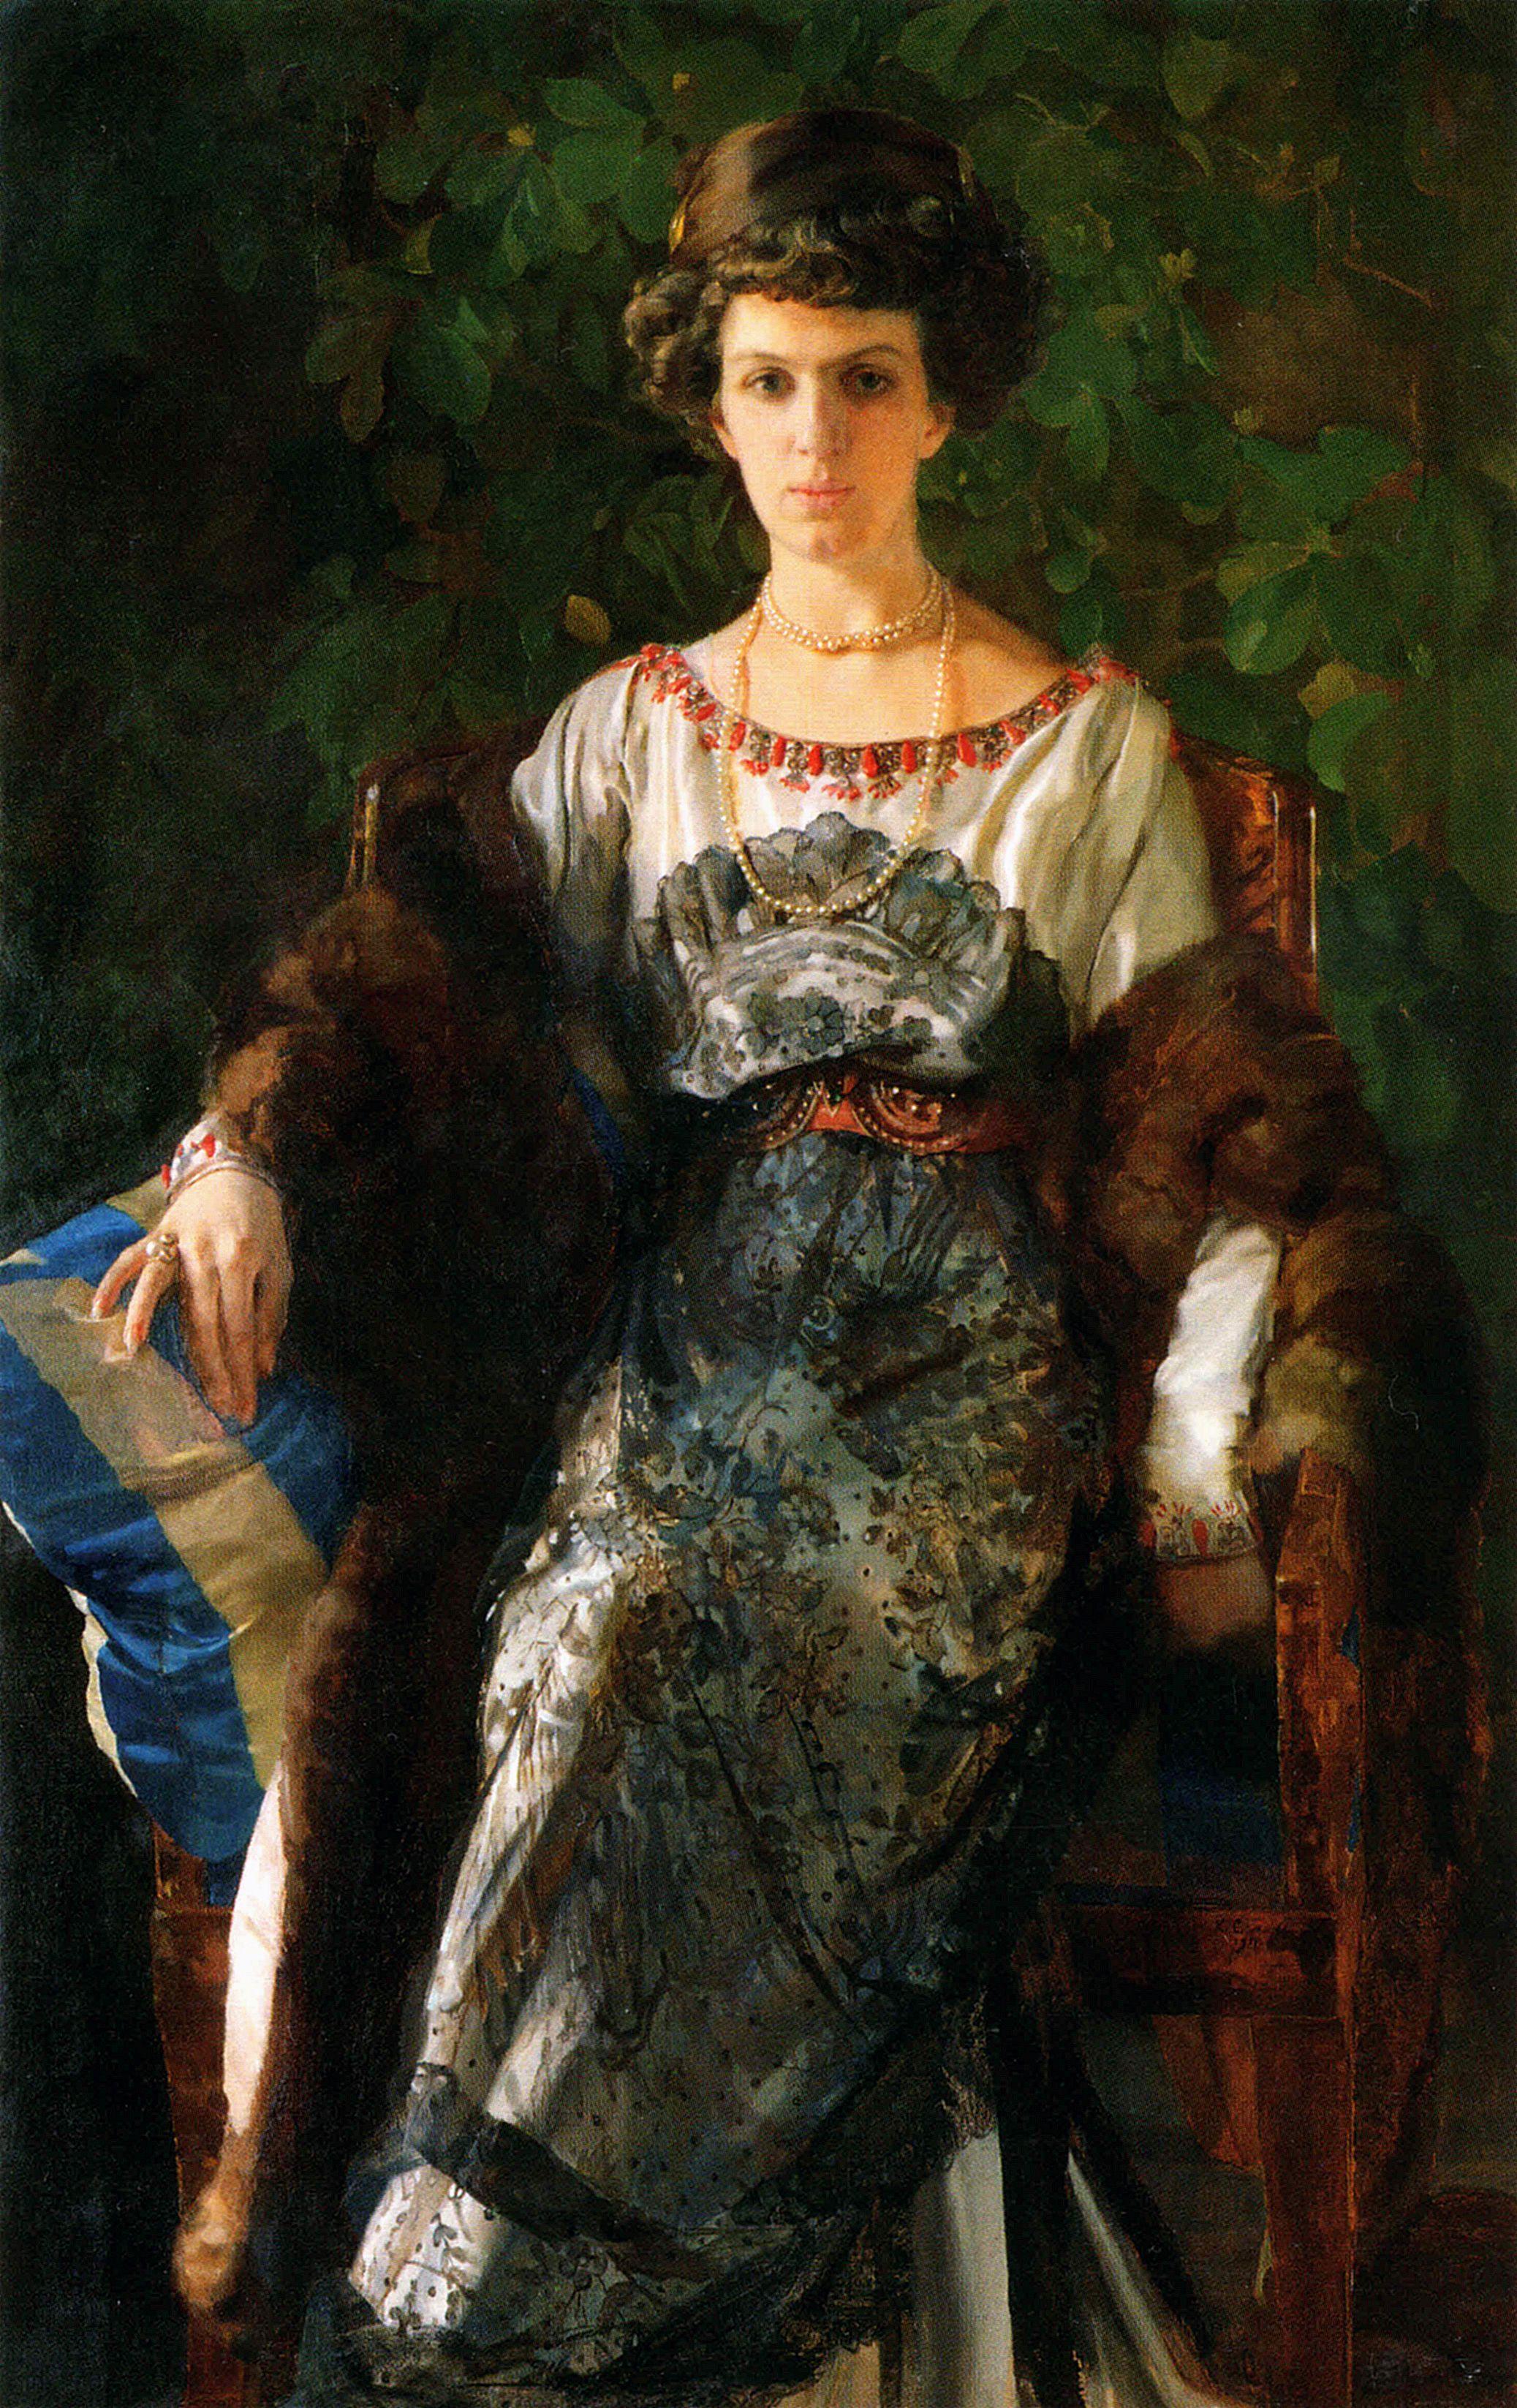 https://upload.wikimedia.org/wikipedia/commons/d/dc/Portrait_of_Euphimia_Nosova_by_Konstantin_Somov.jpg